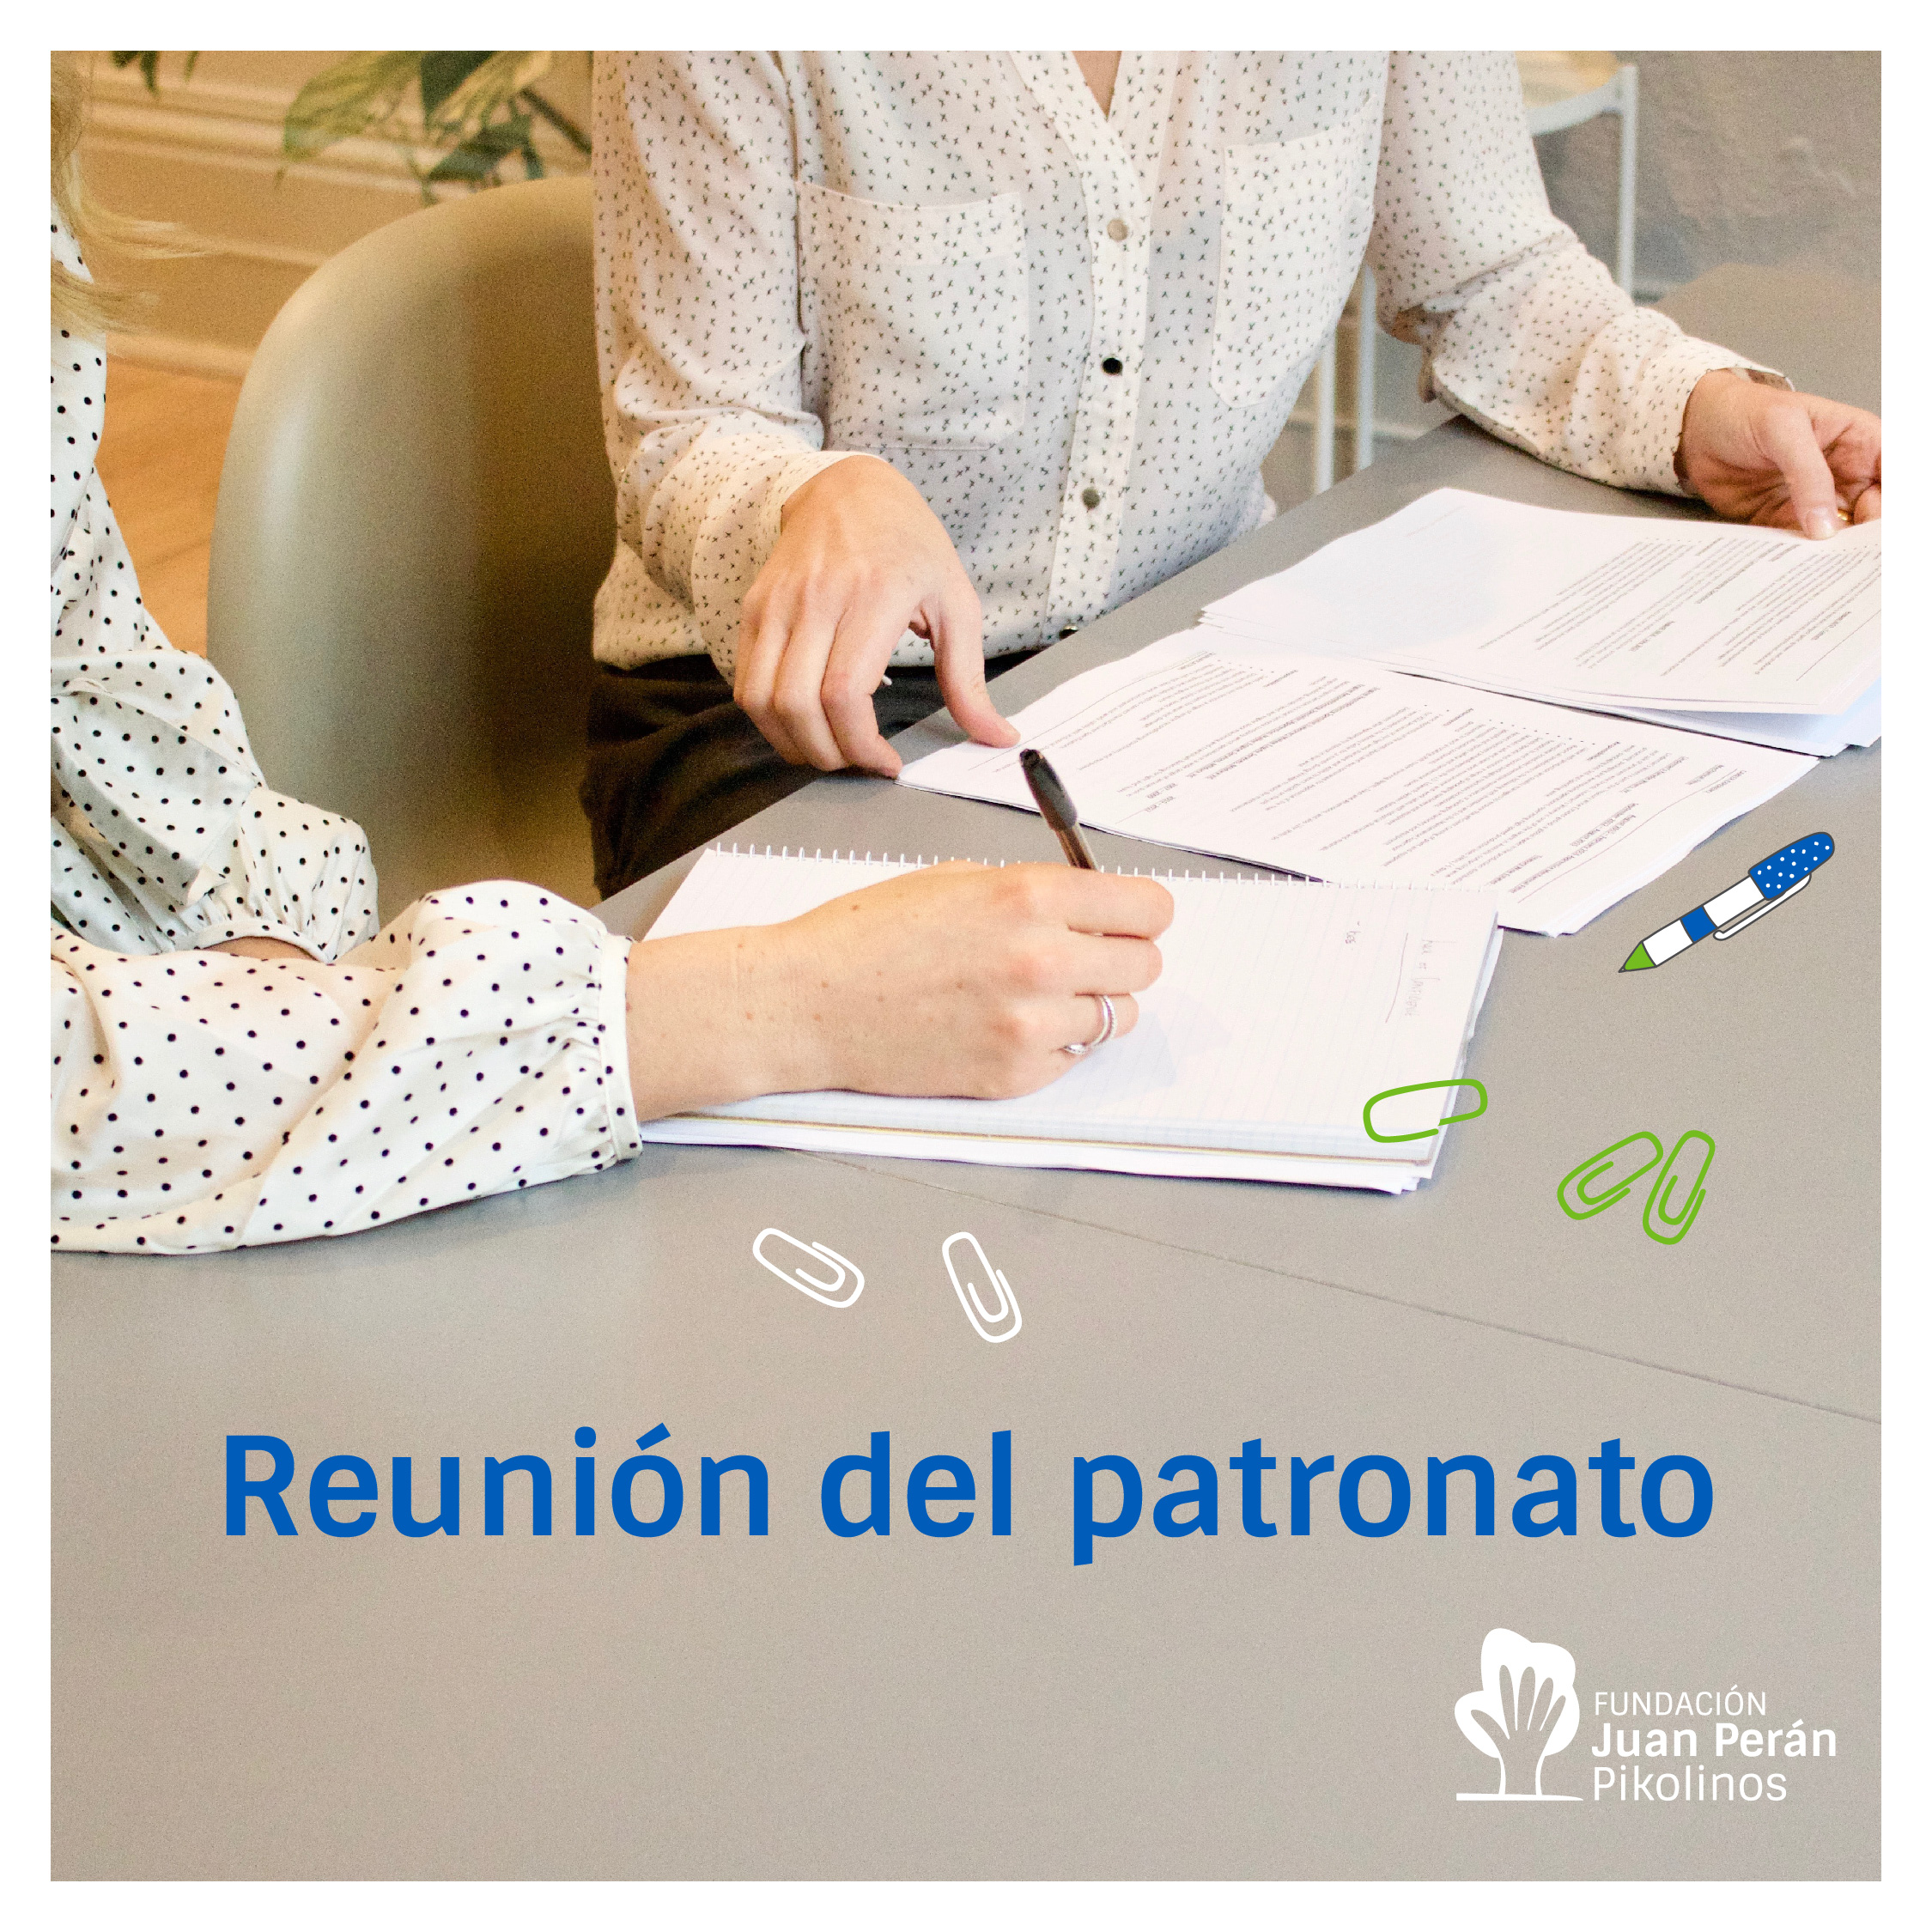 fundacion_rrss_dreunionpatronato_2021__Mesa de trabajo 1